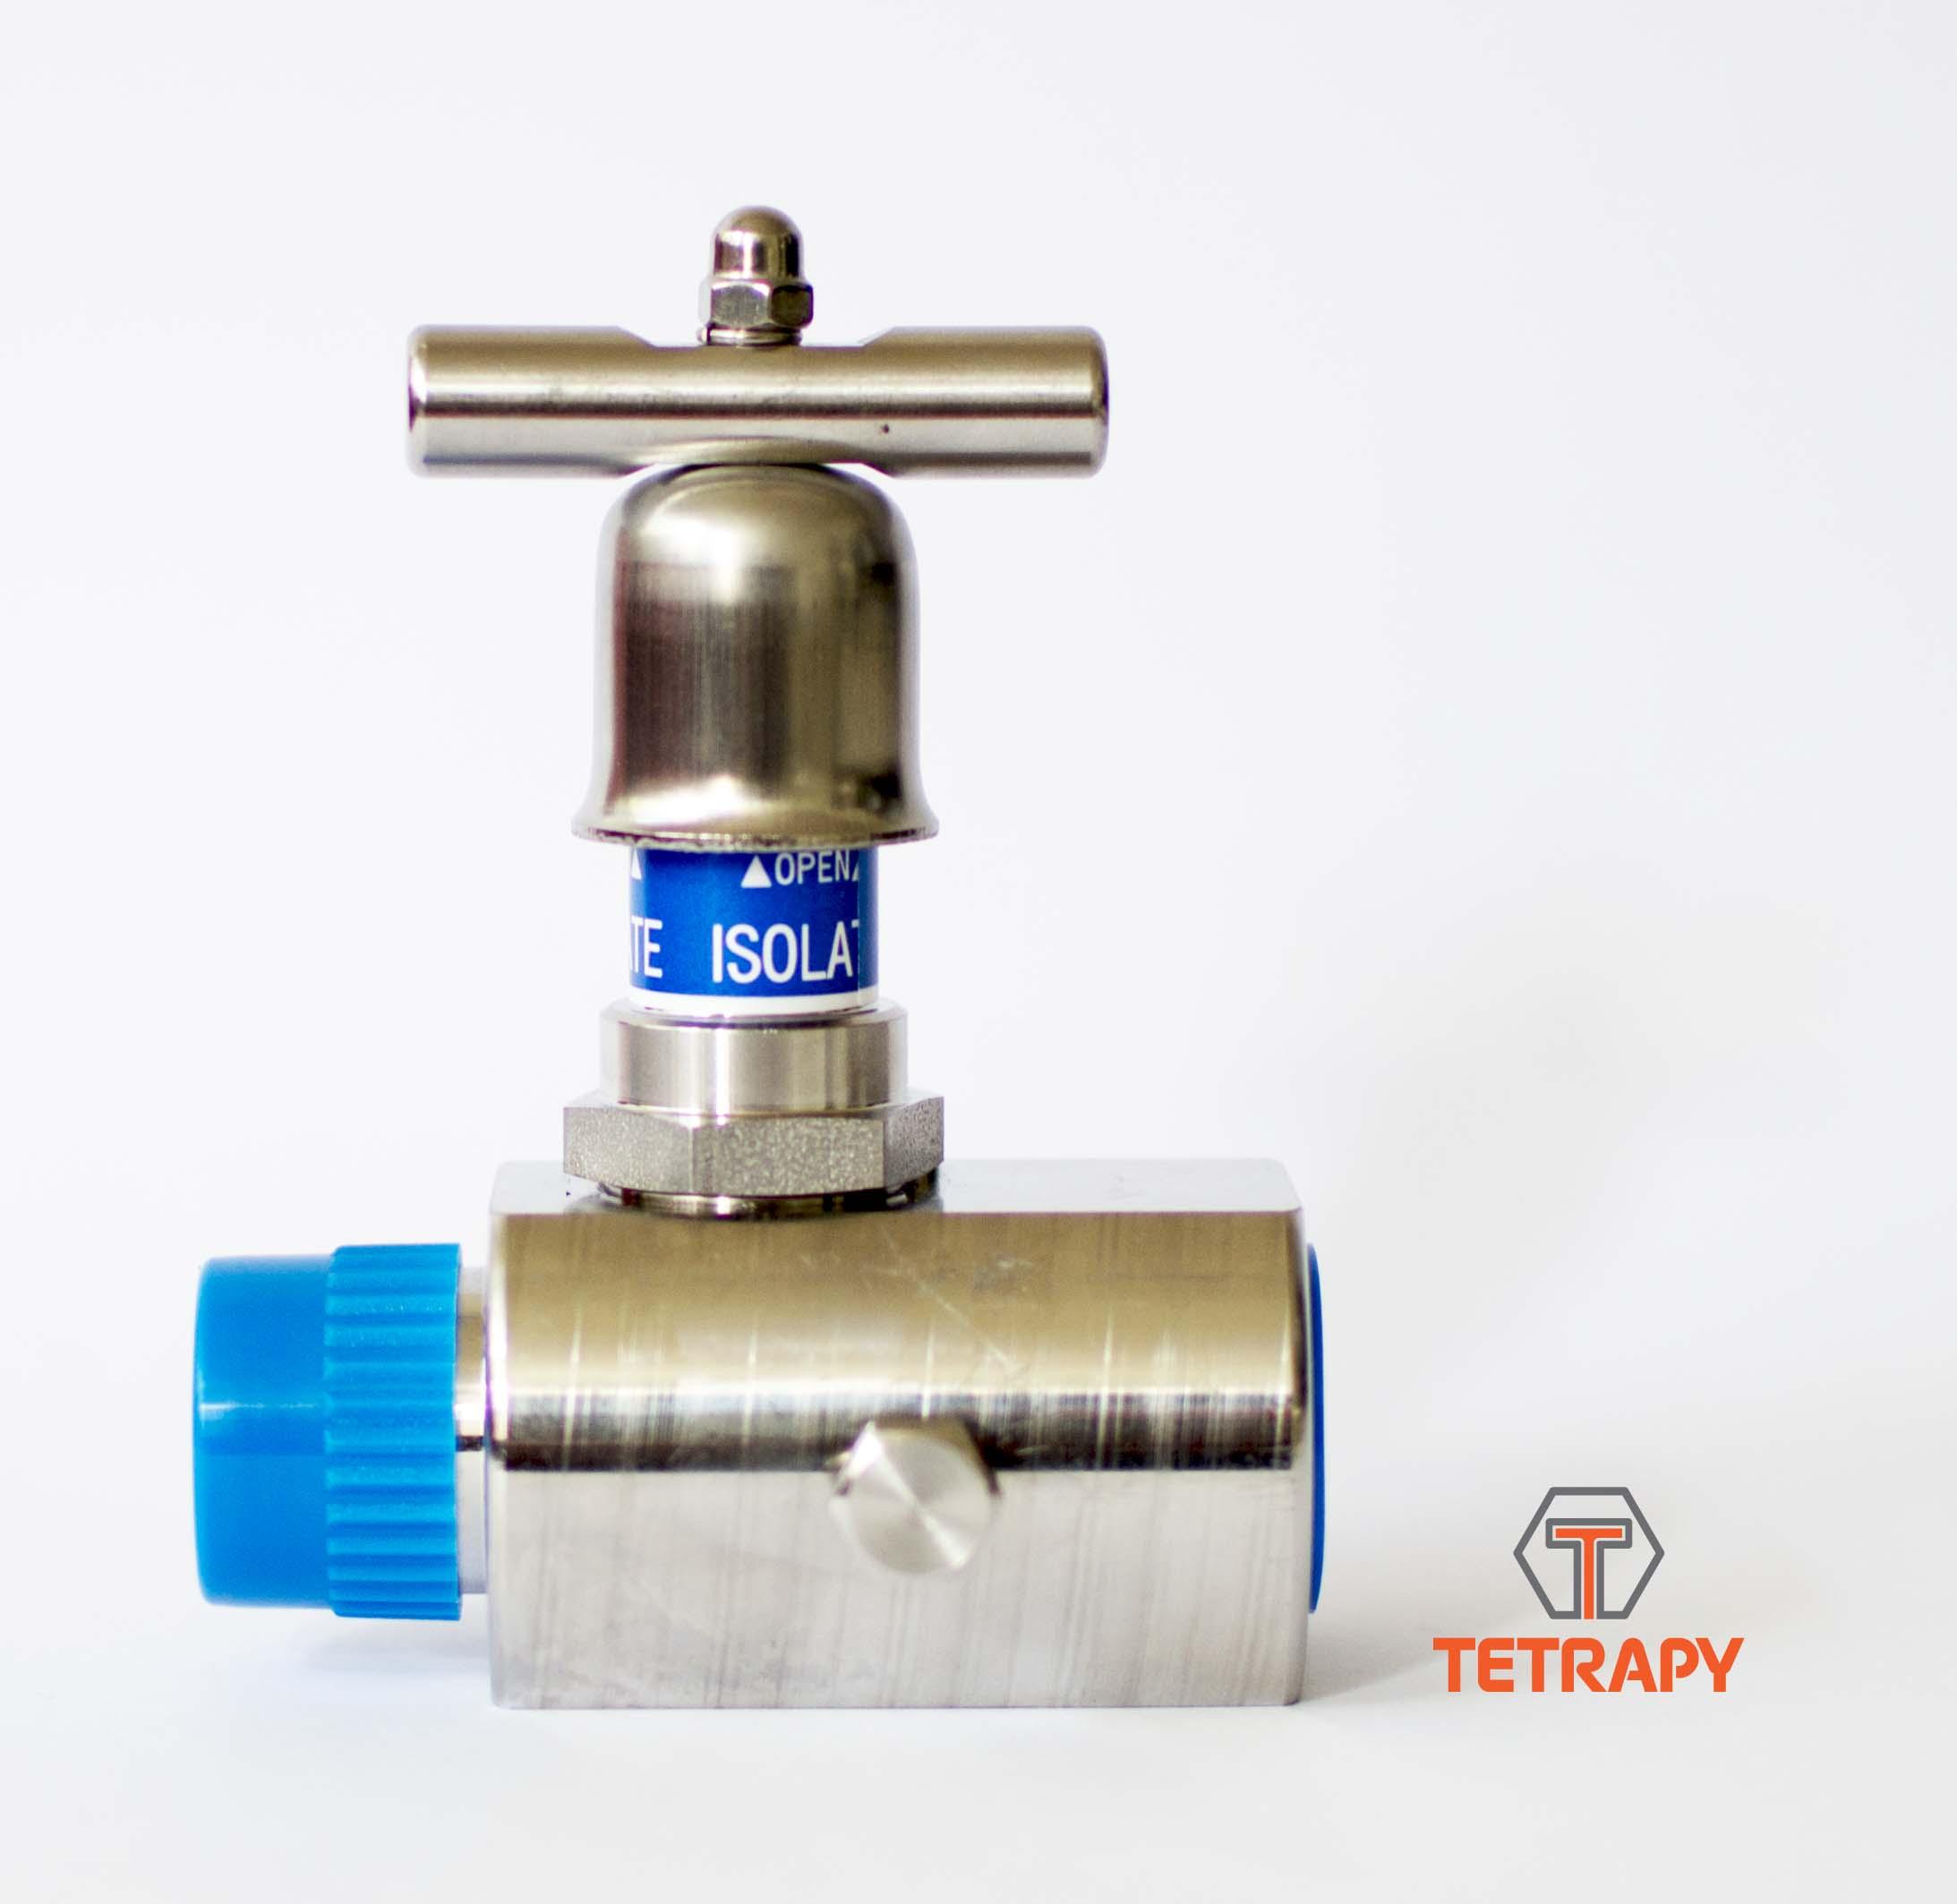 stainless steel needle valve MXF Tetrapy